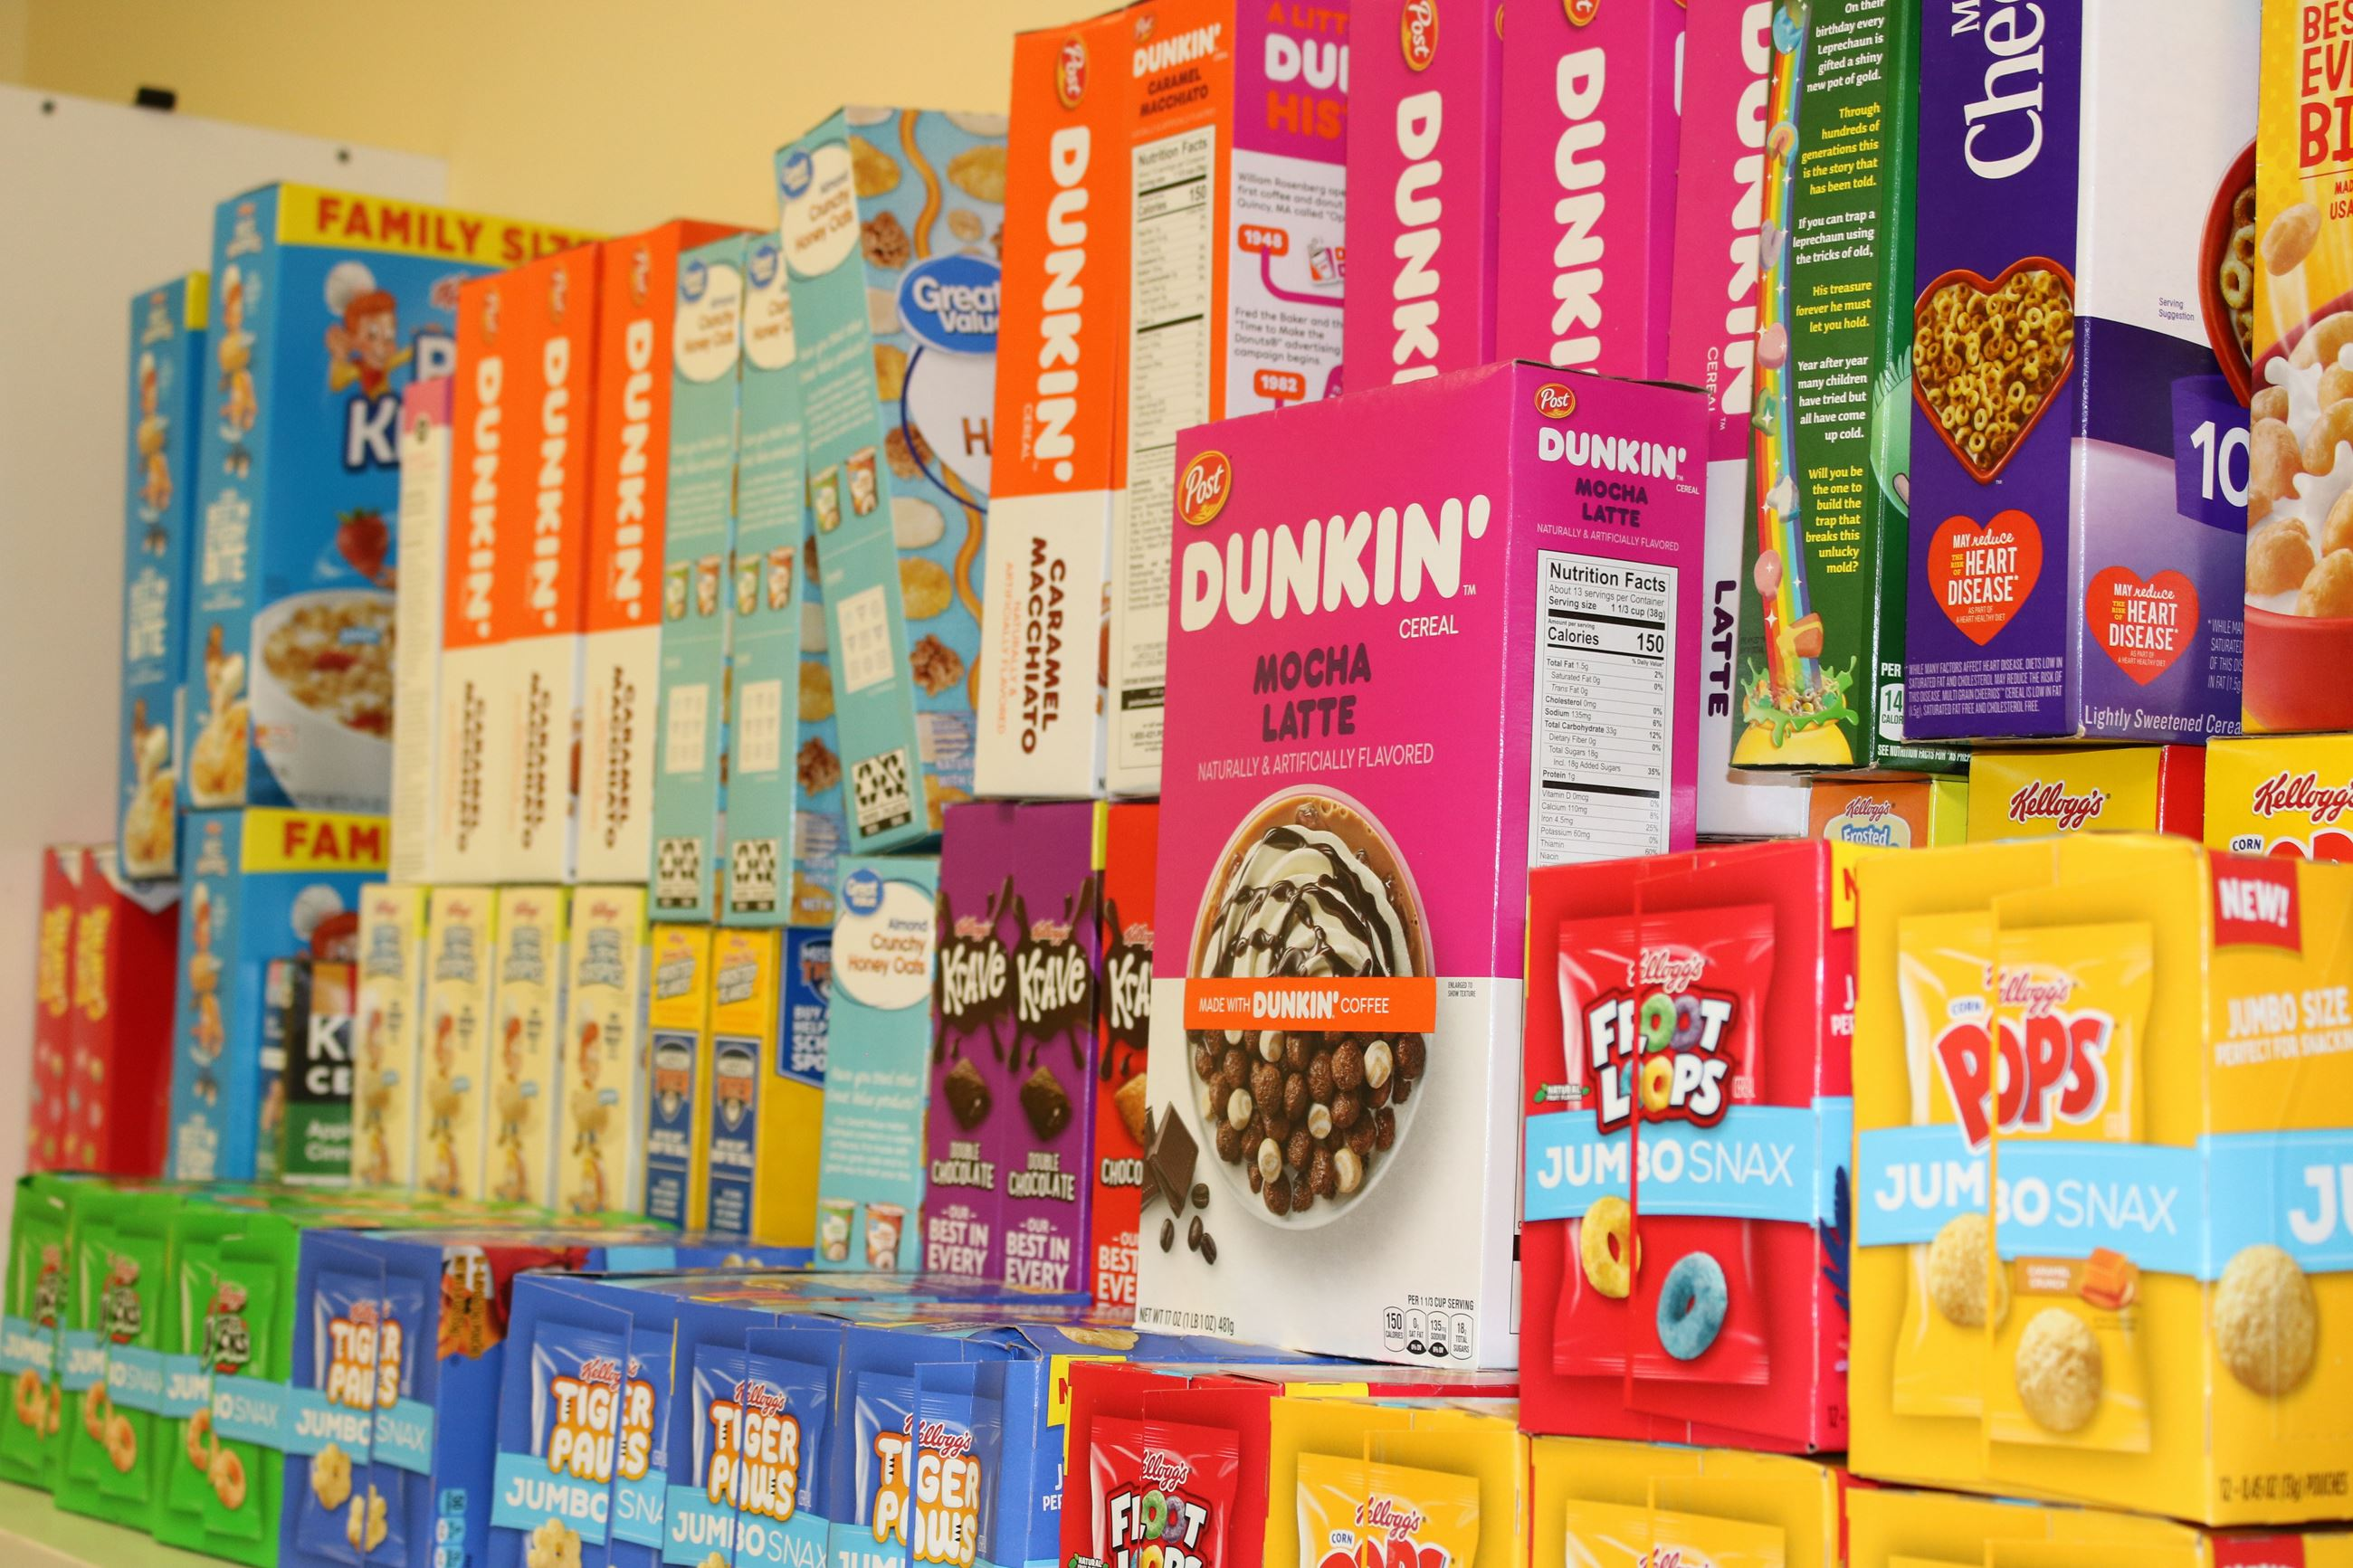 Image for nonperishable food items in Tamarac's food pantry